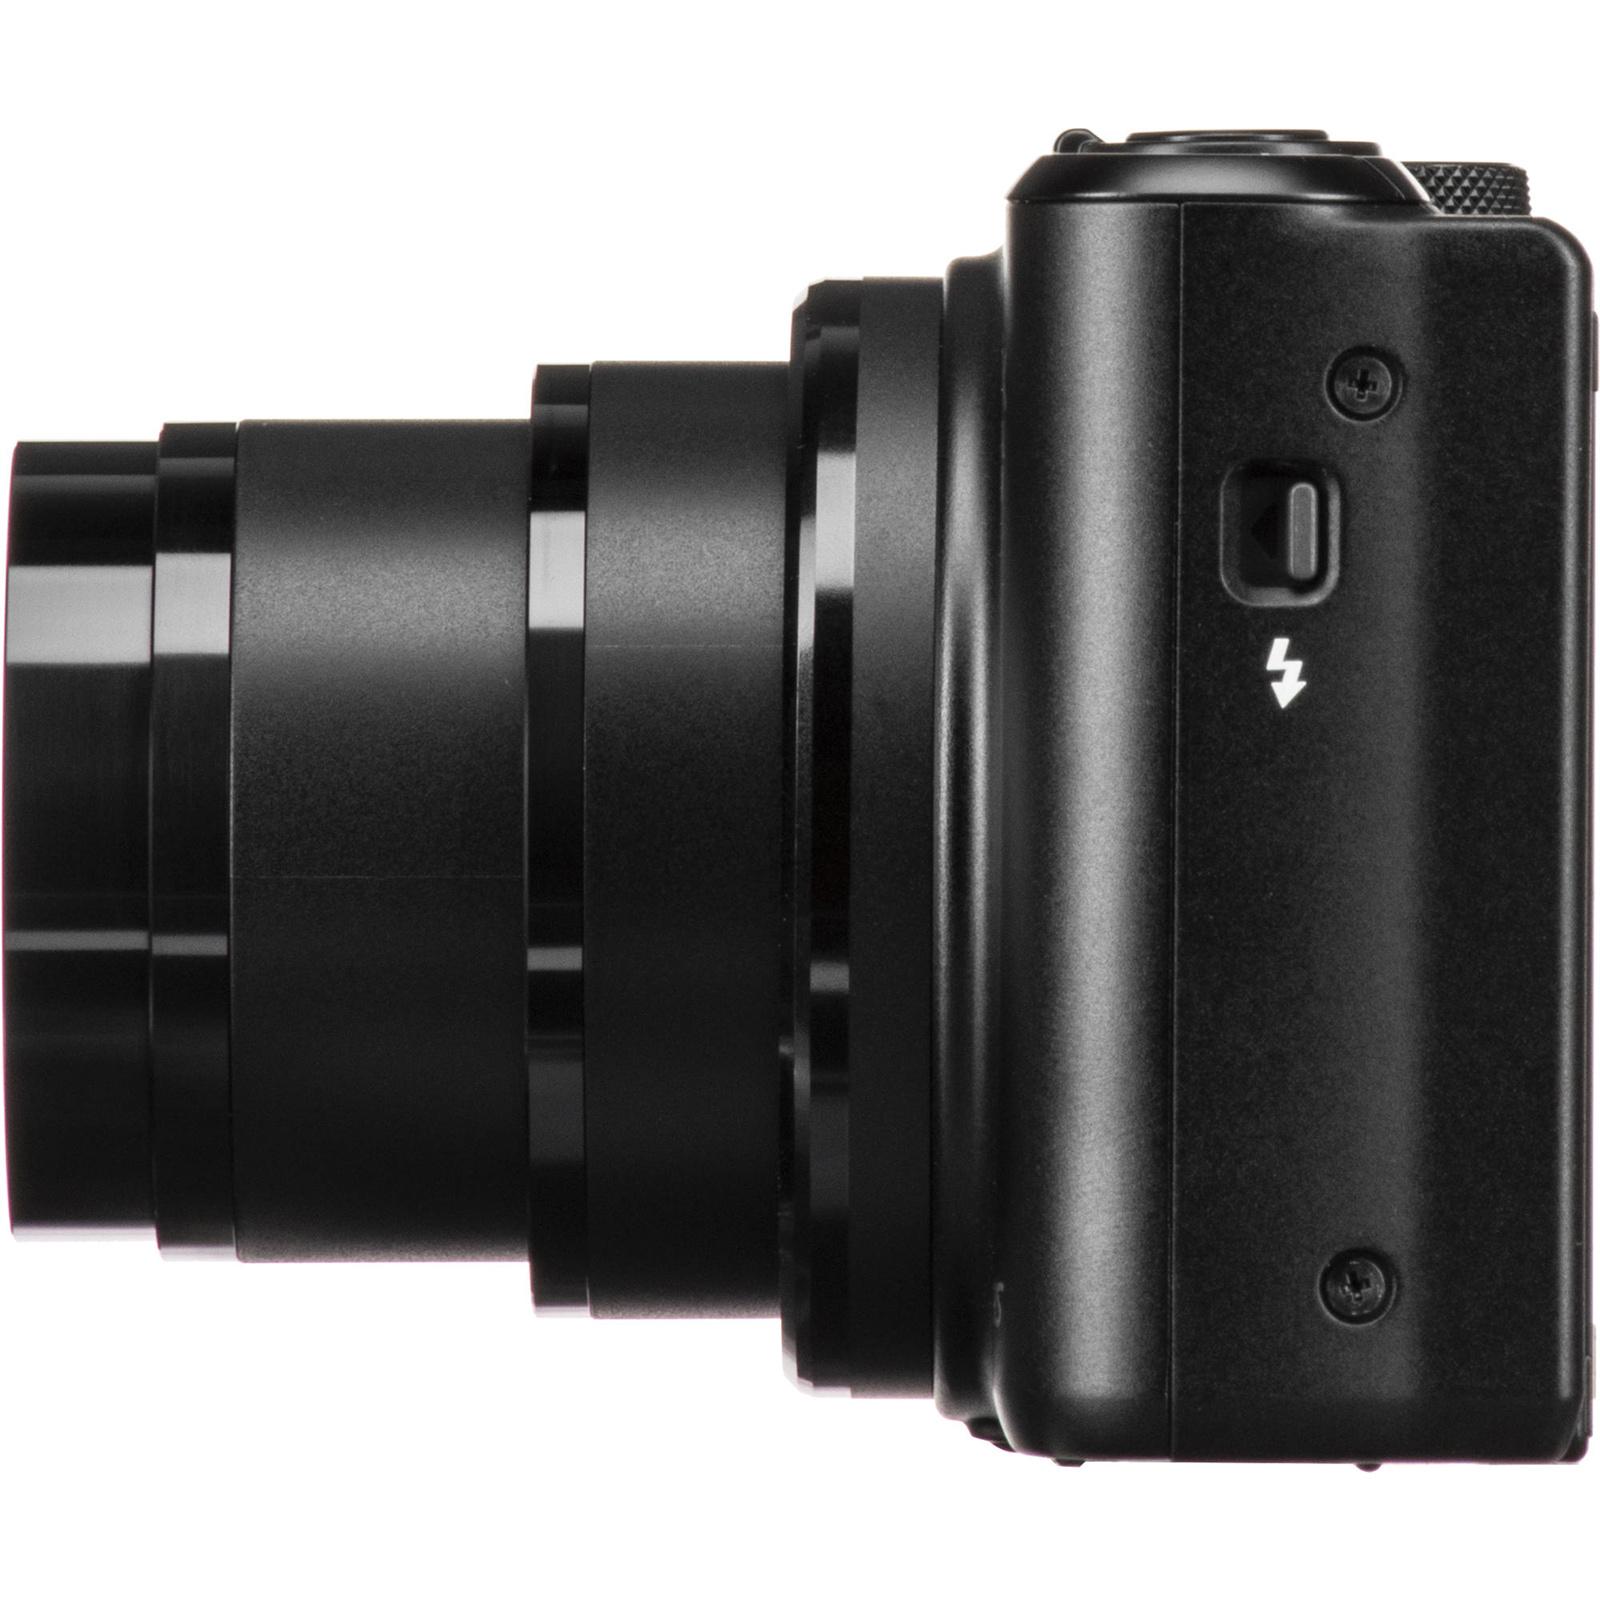 Buy The Canon Powershot Sx740 Hs Digital Camera Black 20 3 Megapixel 40x Sx740hsb Online Pbtech Co Nz